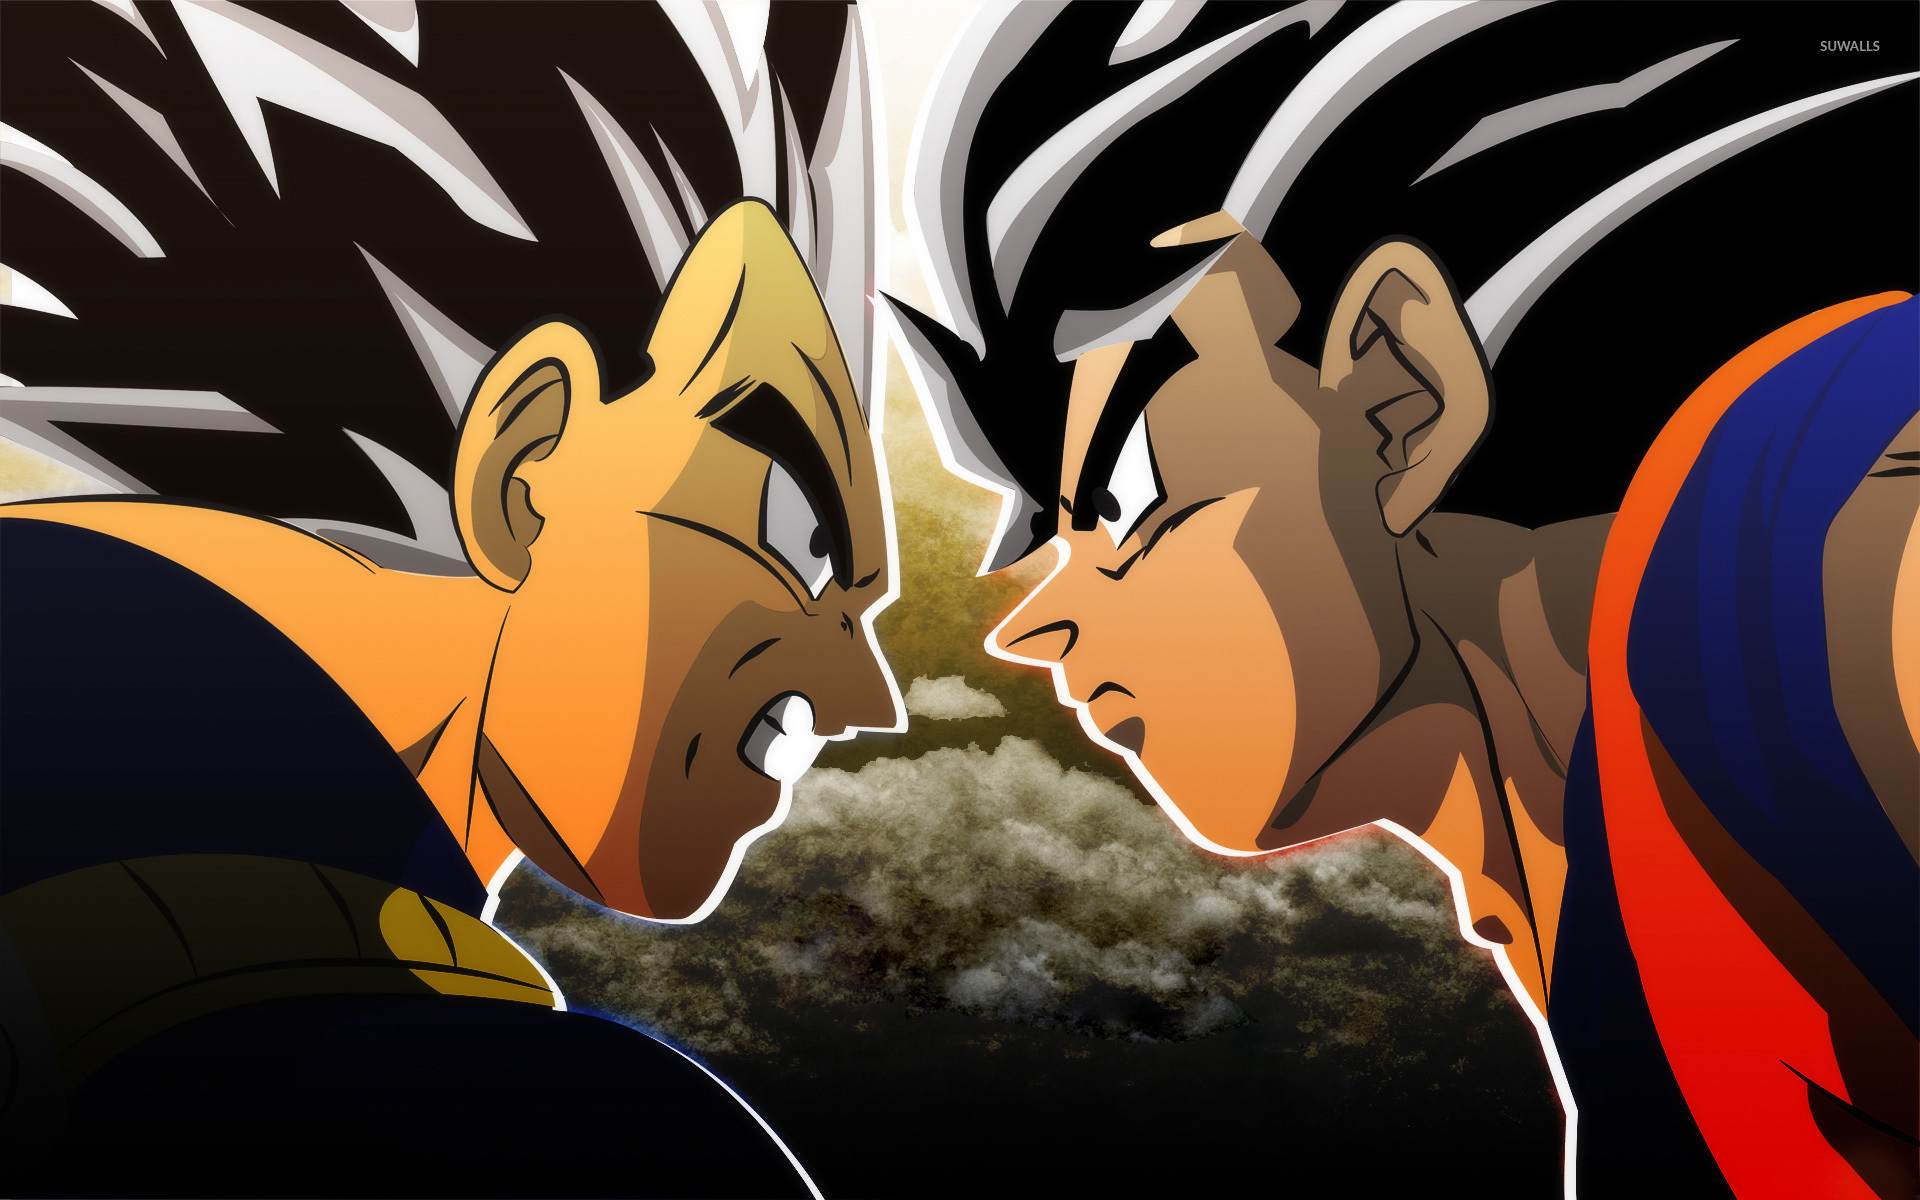 Goku vs vegeta dragon ball z wallpaper anime - Dbz goku vegeta ...